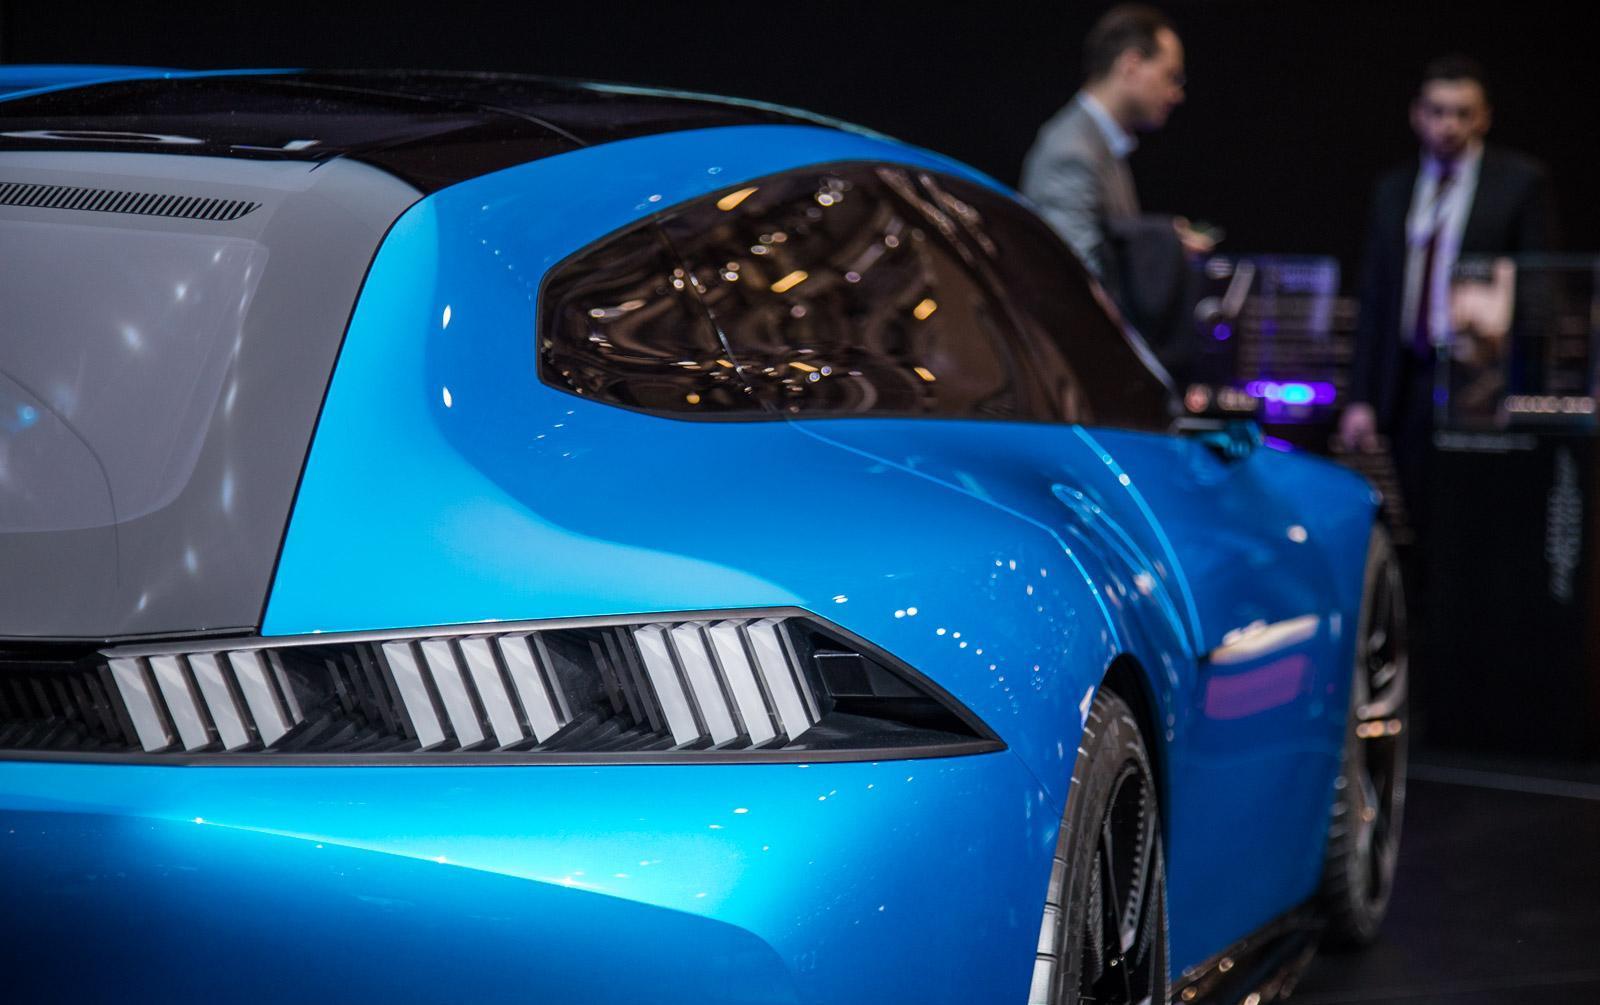 Peugeot-instinct-concept-014